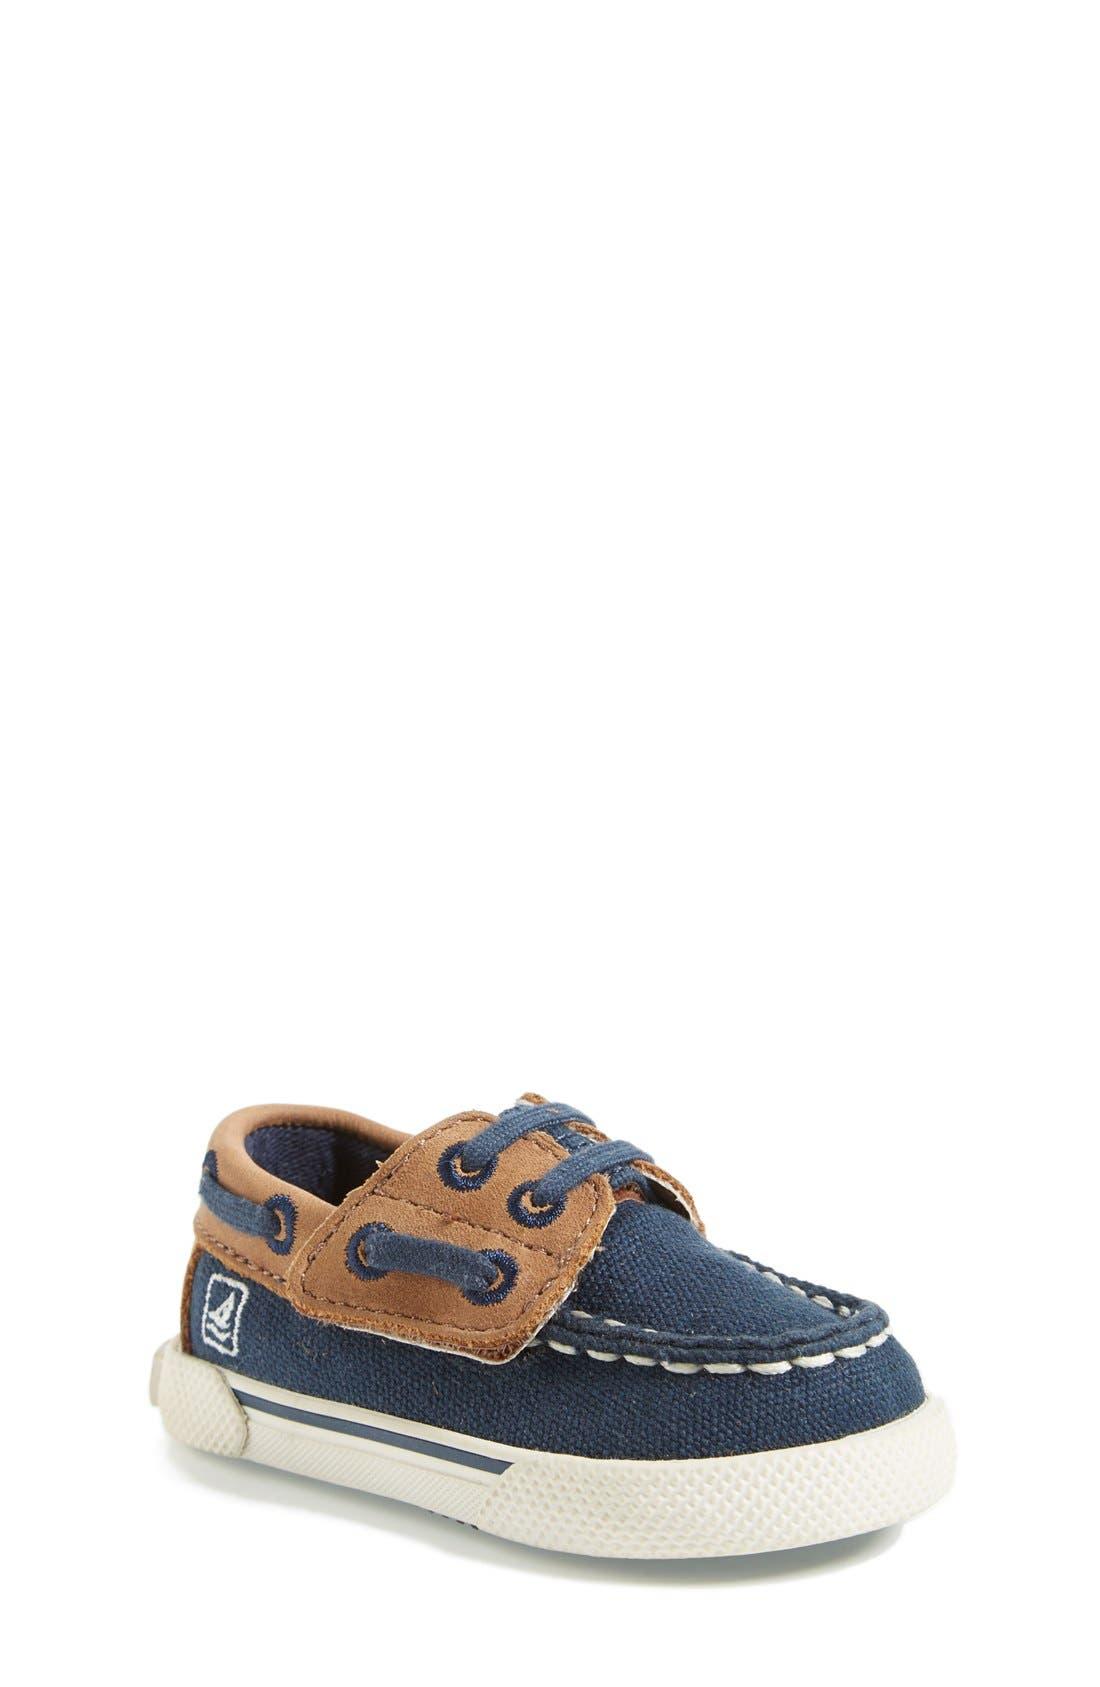 Main Image - Sperry Top-Sider® Kids 'Halyard' Crib Shoe (Baby)